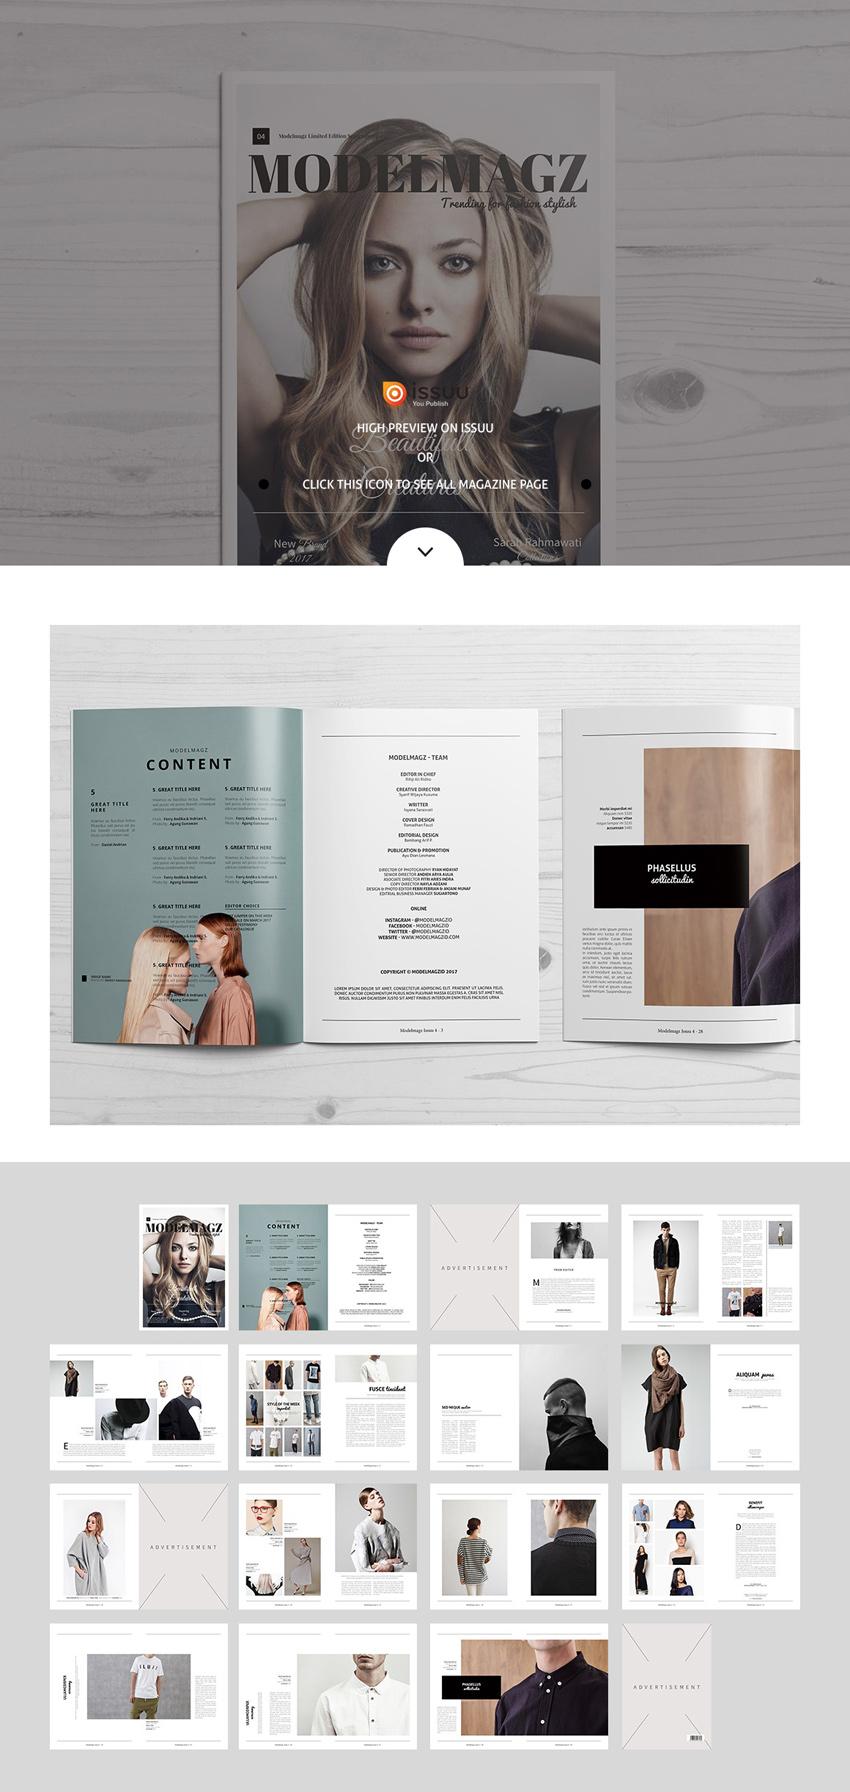 时尚服饰画册模版下载[For Indesign]modelmagz-magazine-4